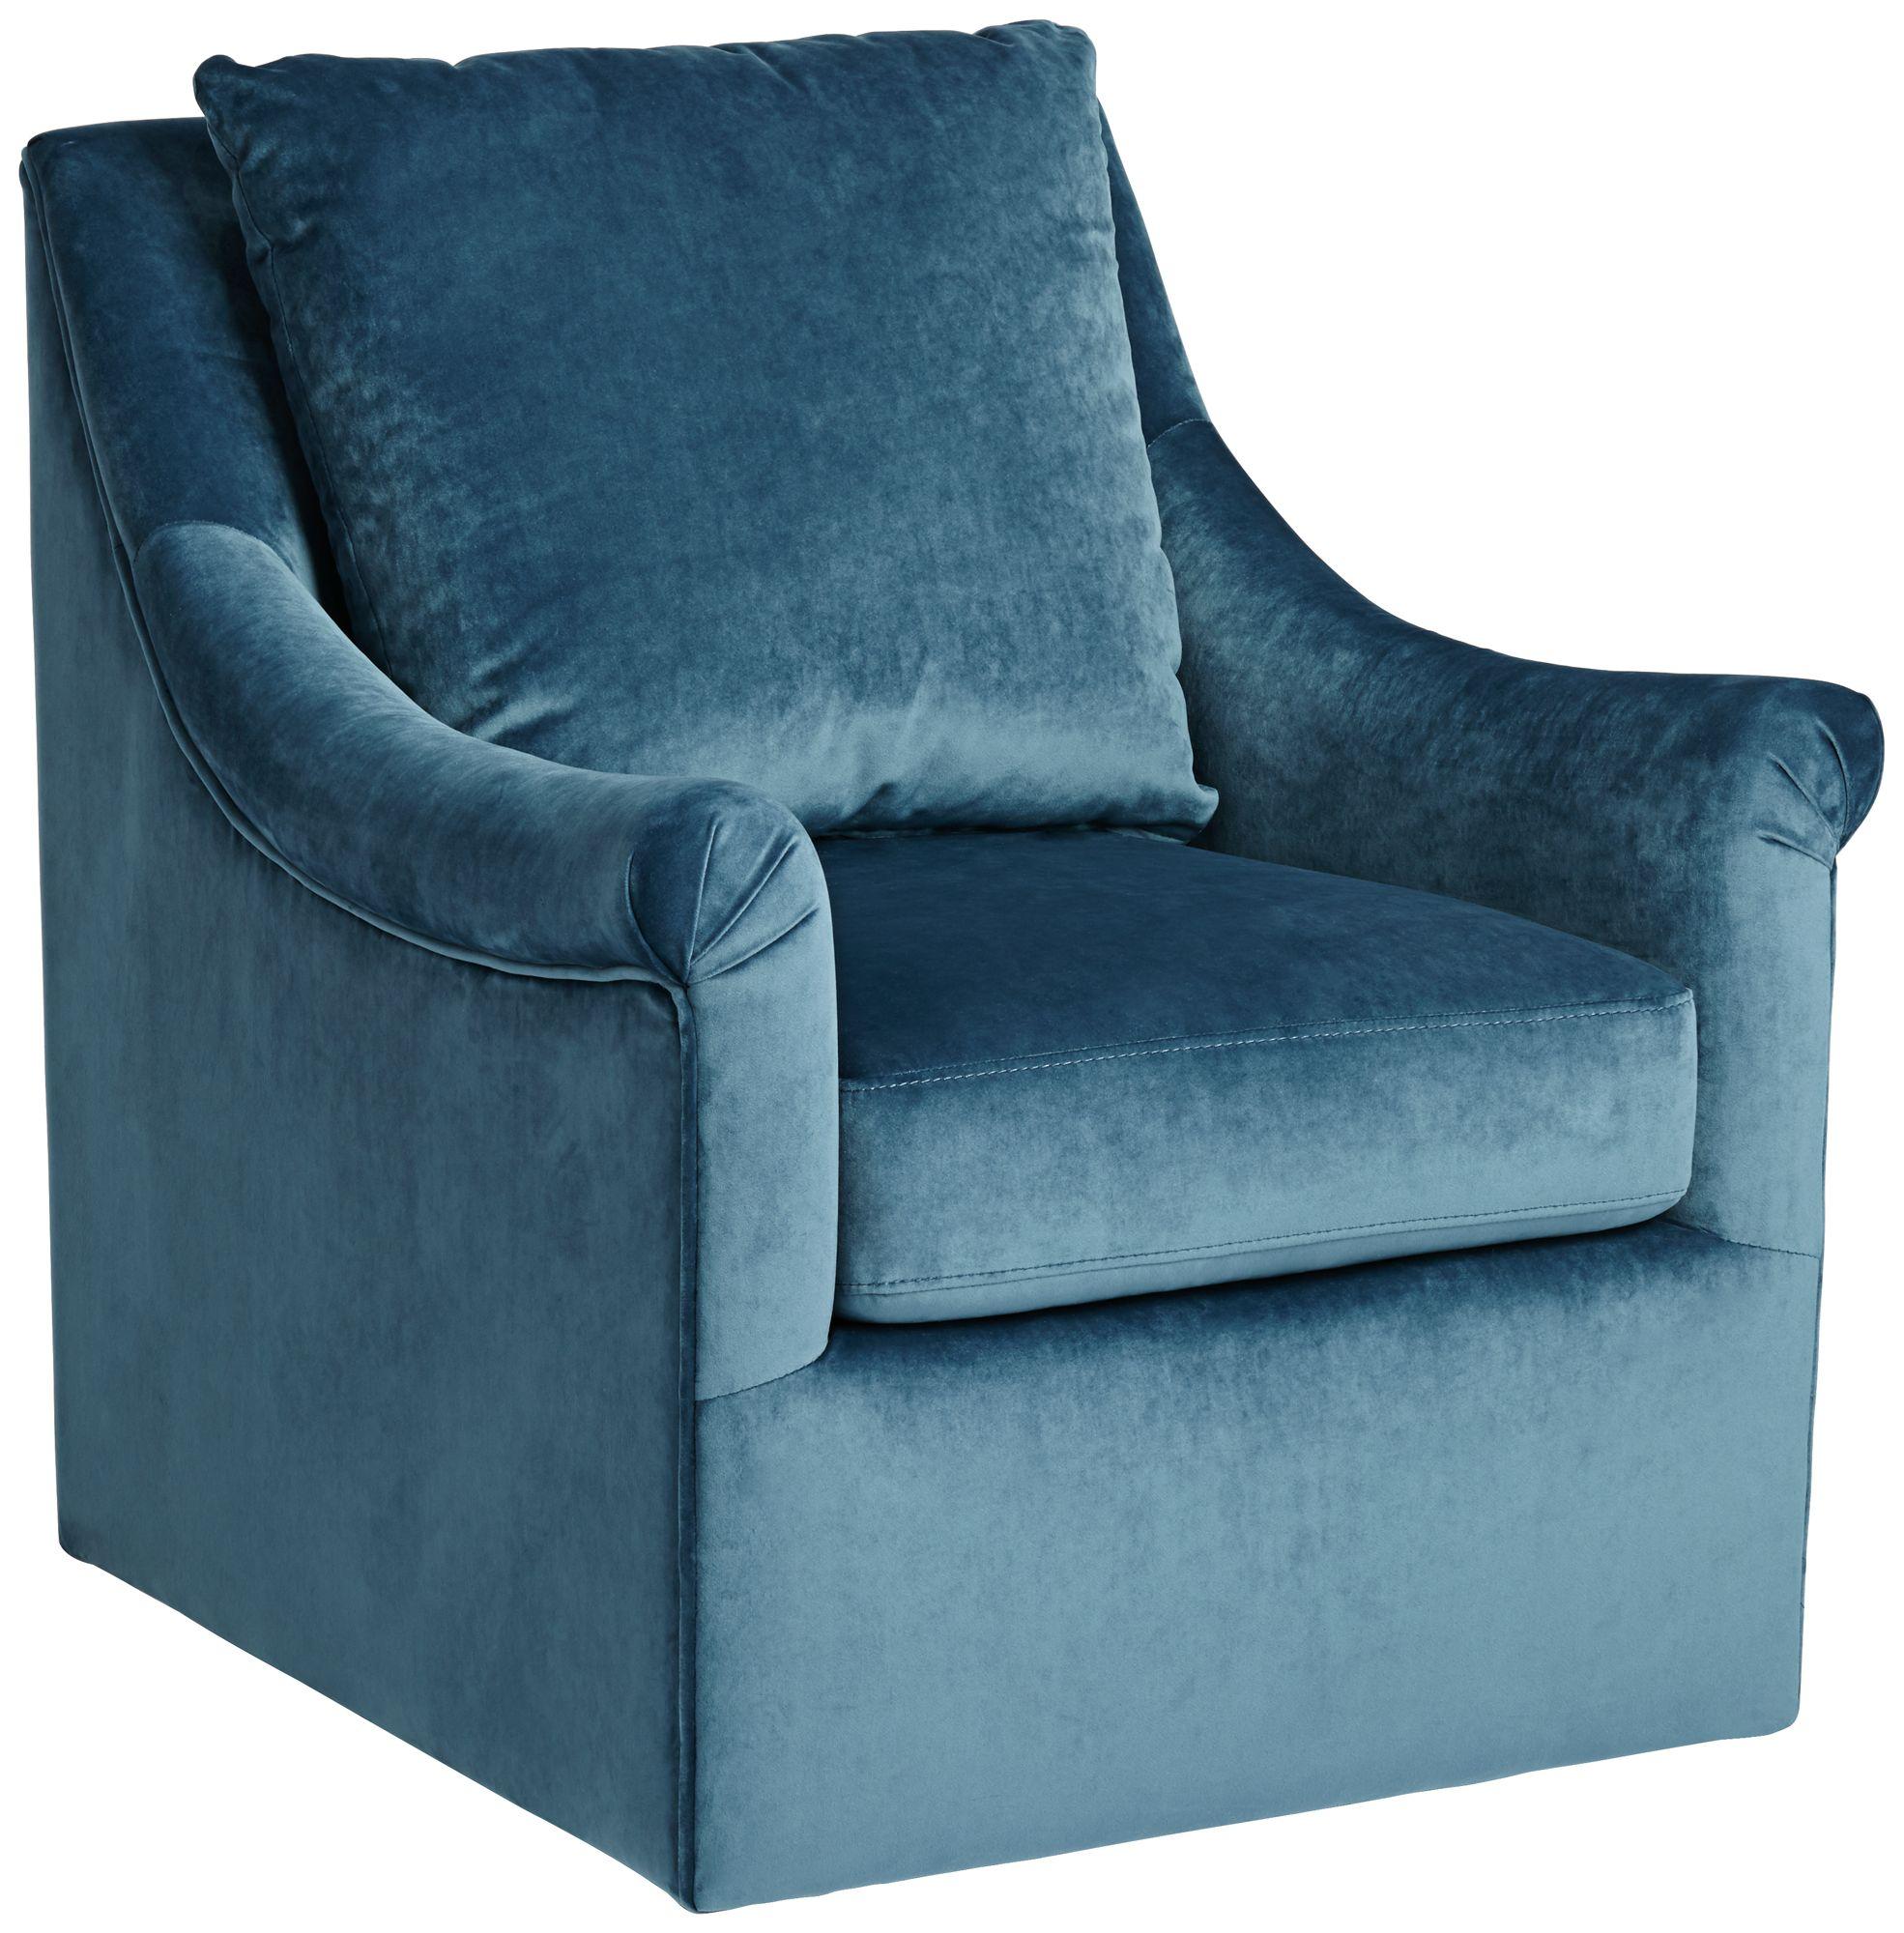 Deanna Blue Upholstered Swivel Armchair